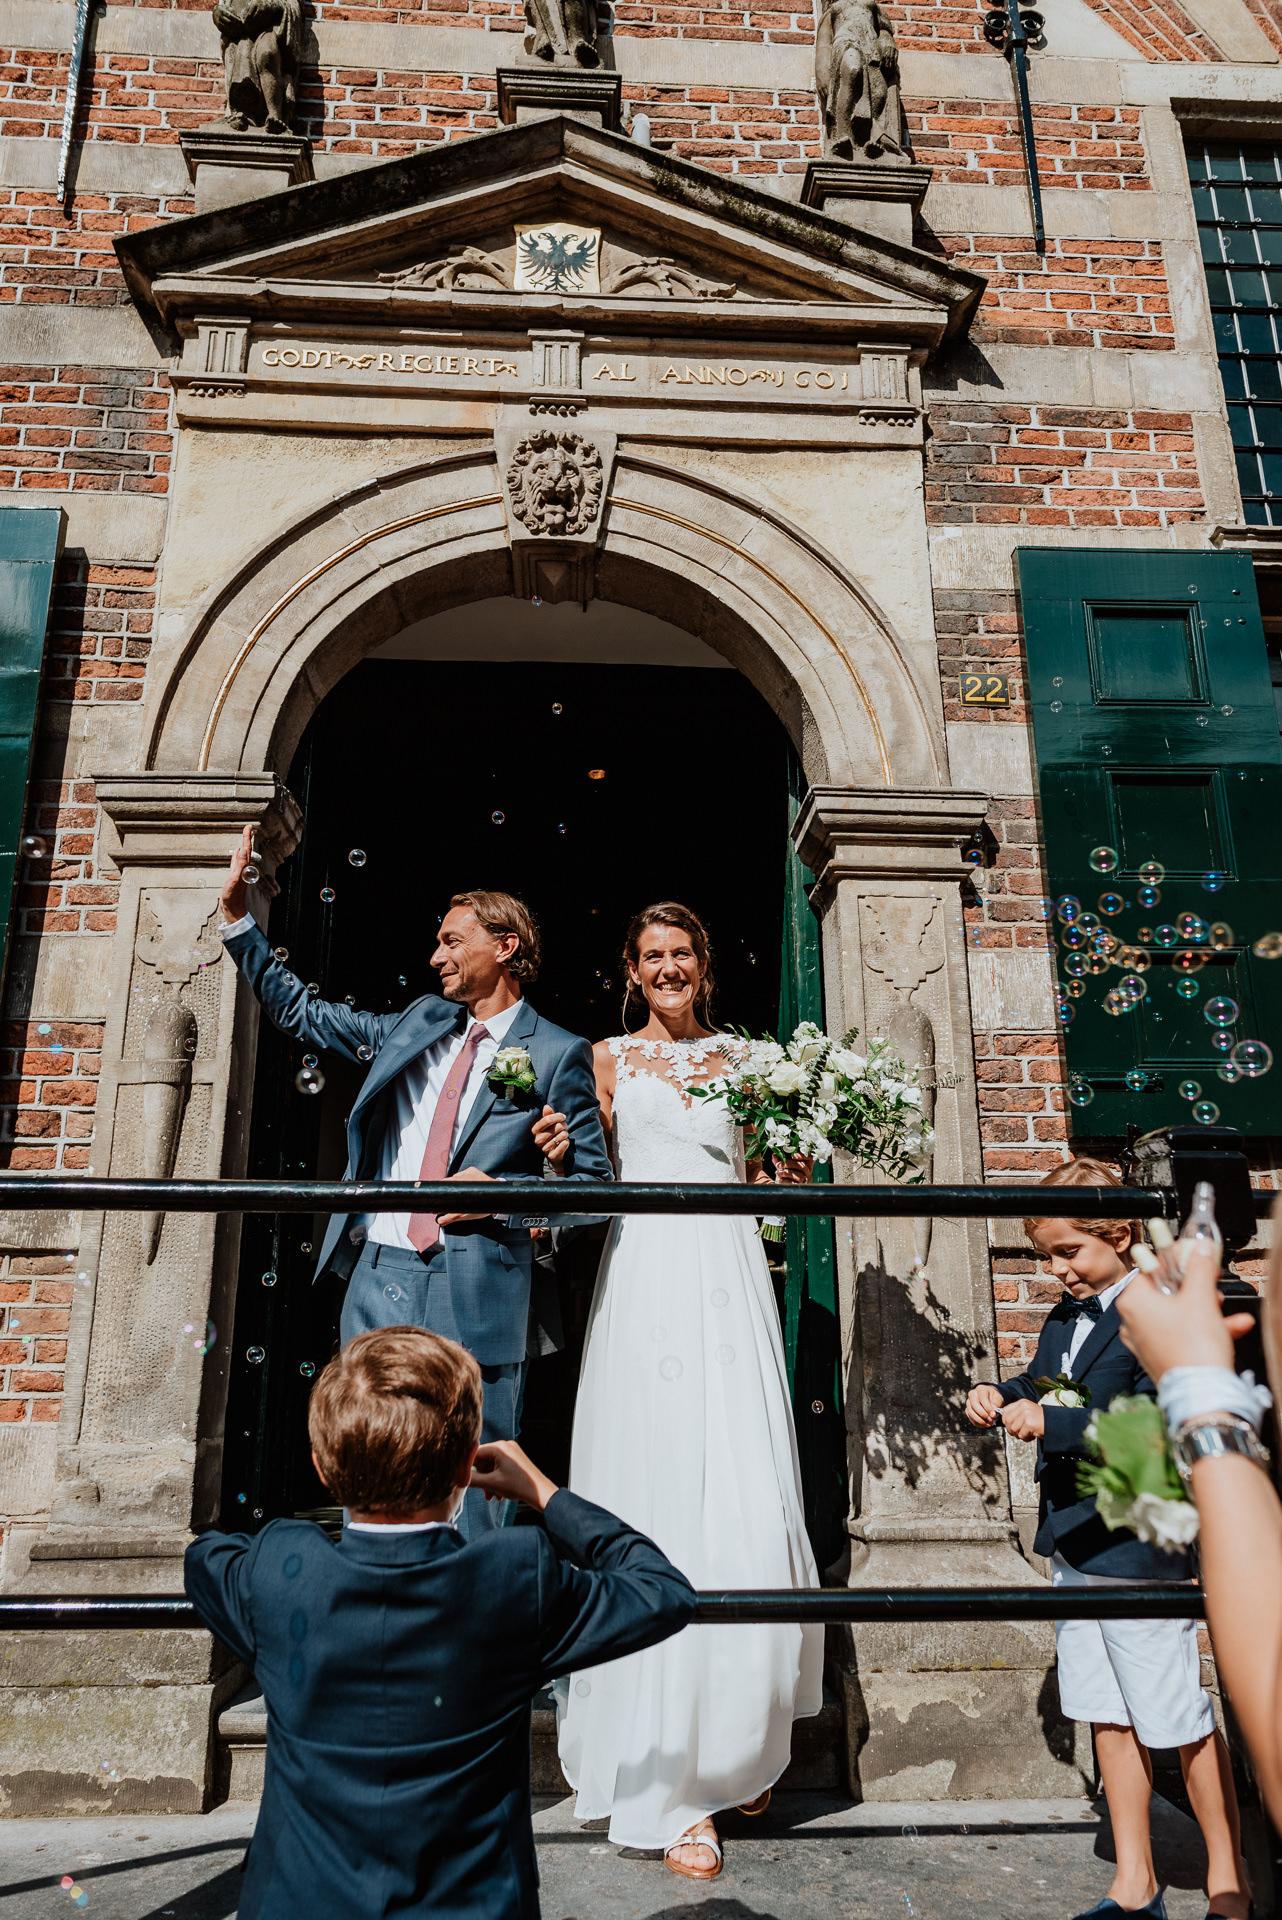 netherland wedding photography